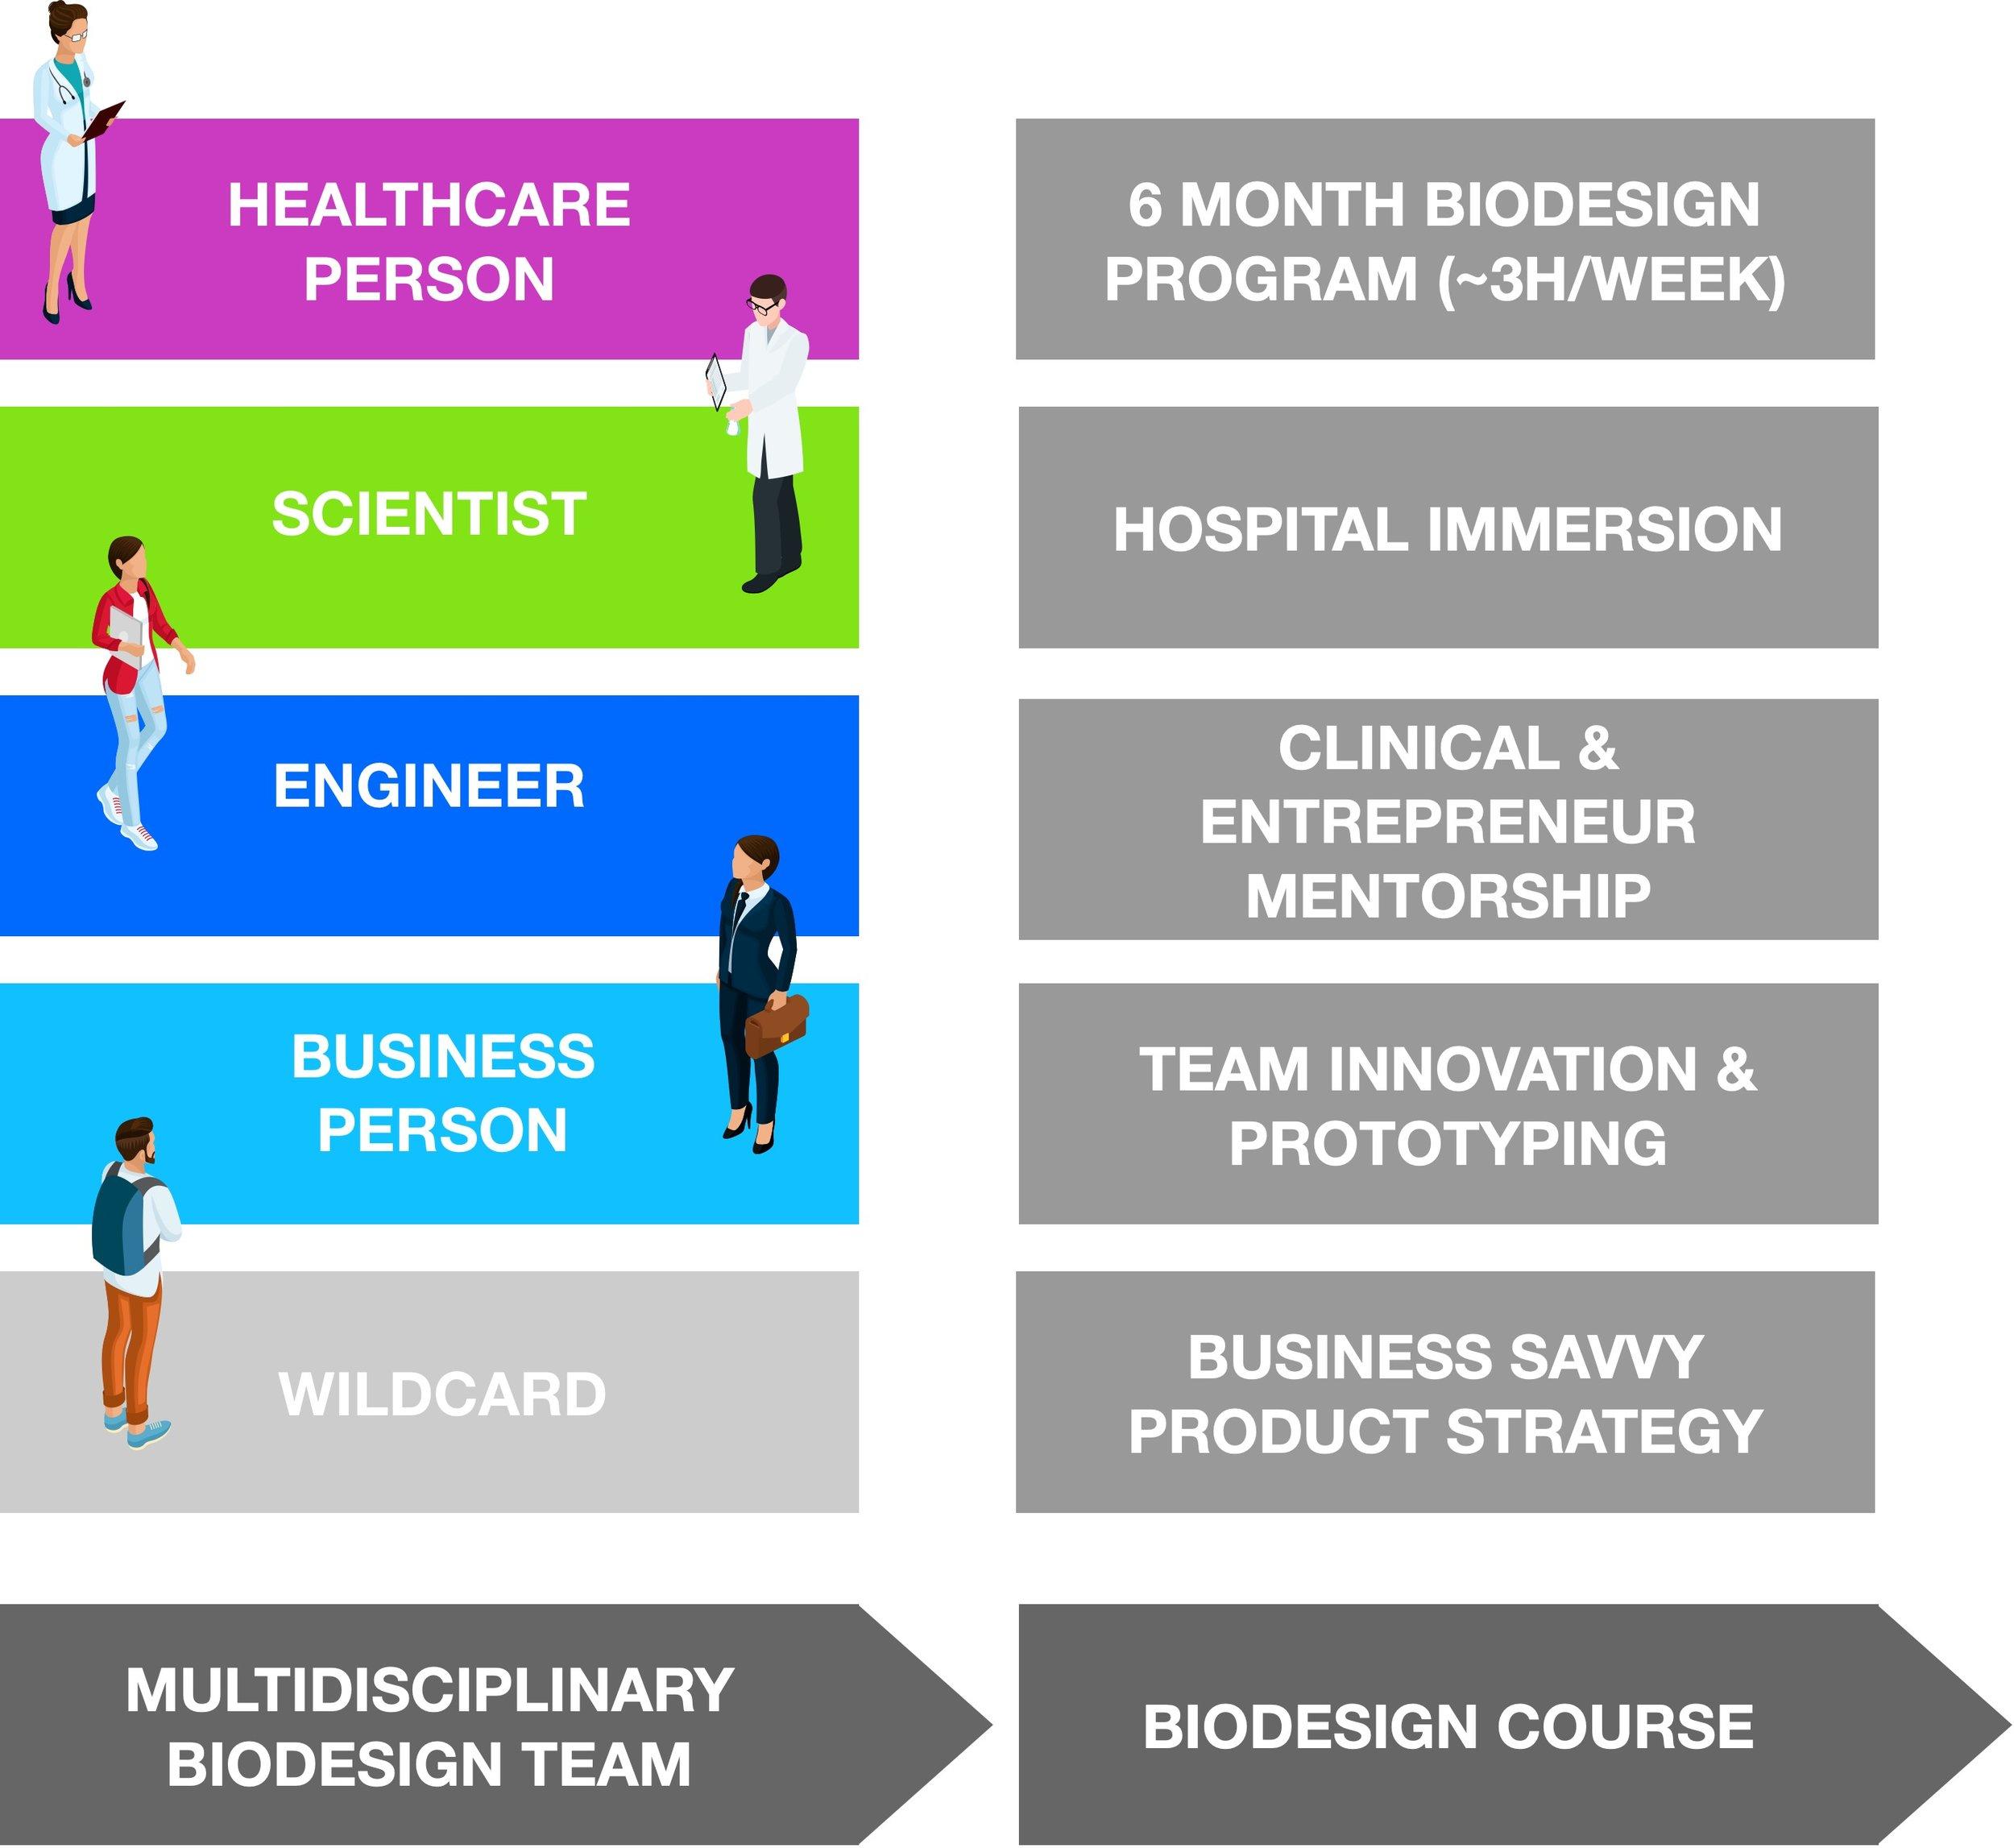 Biodesign infographic.jpg